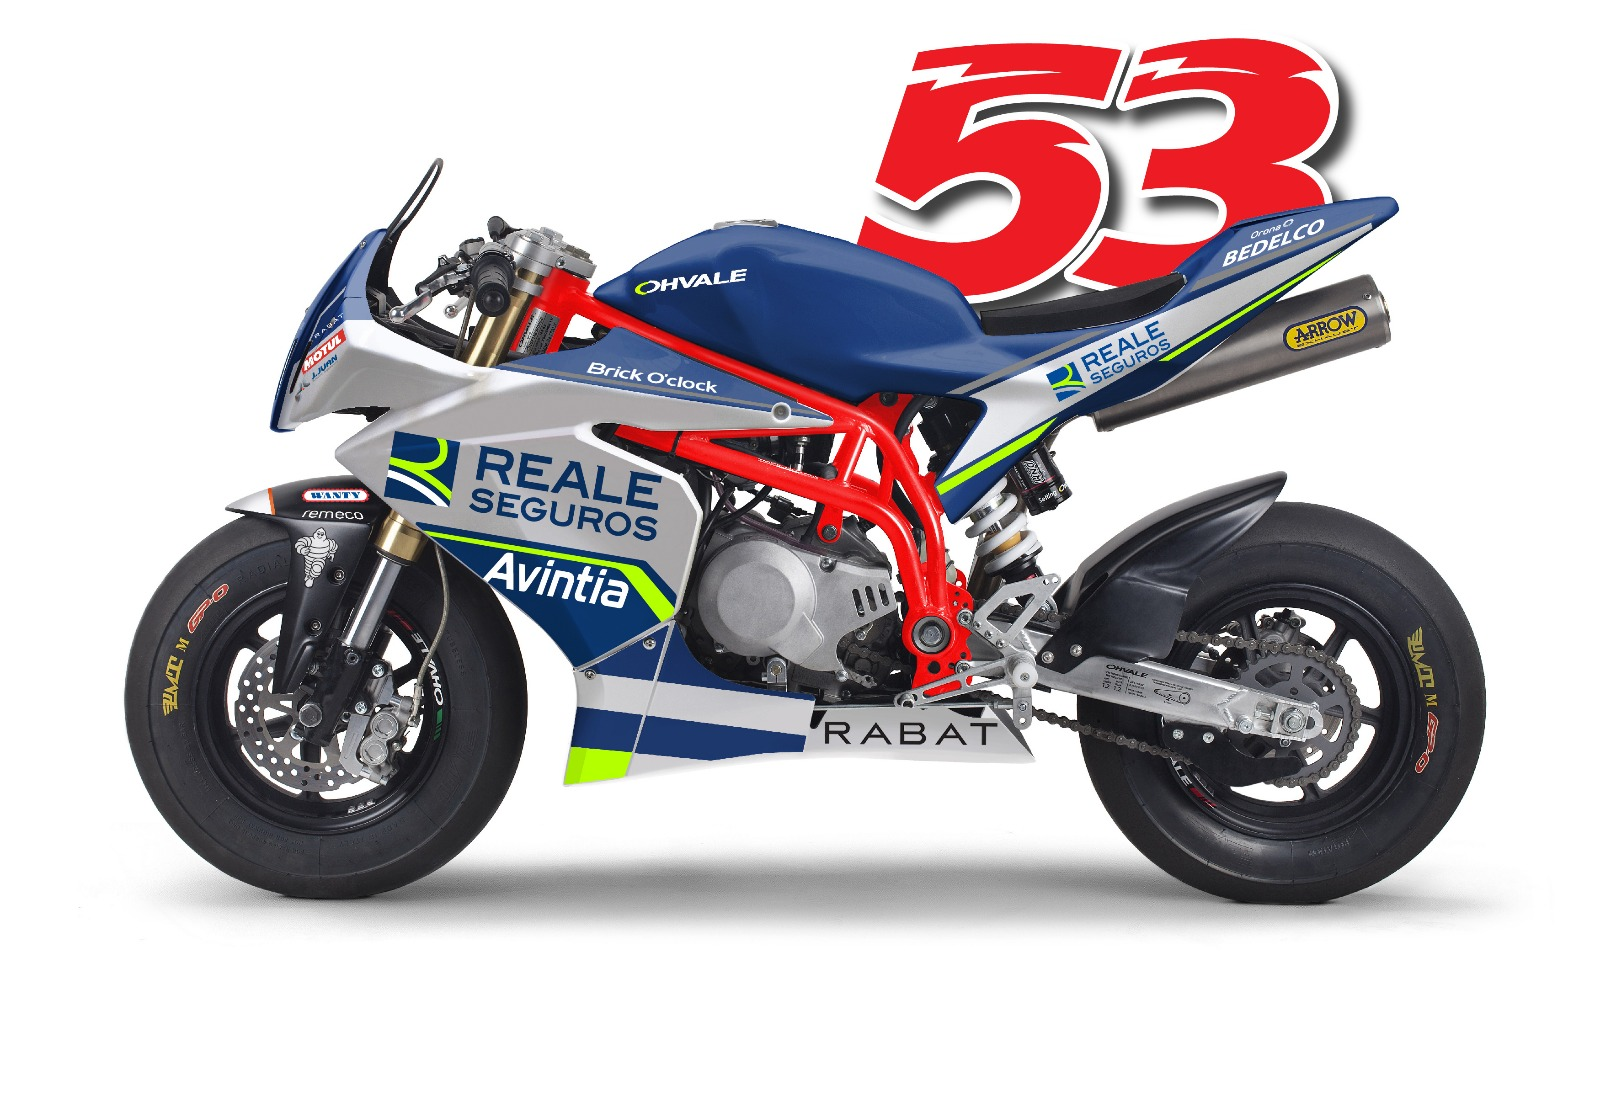 Reale Avintia Ducati MotoGP 2018 - Tito Rabat